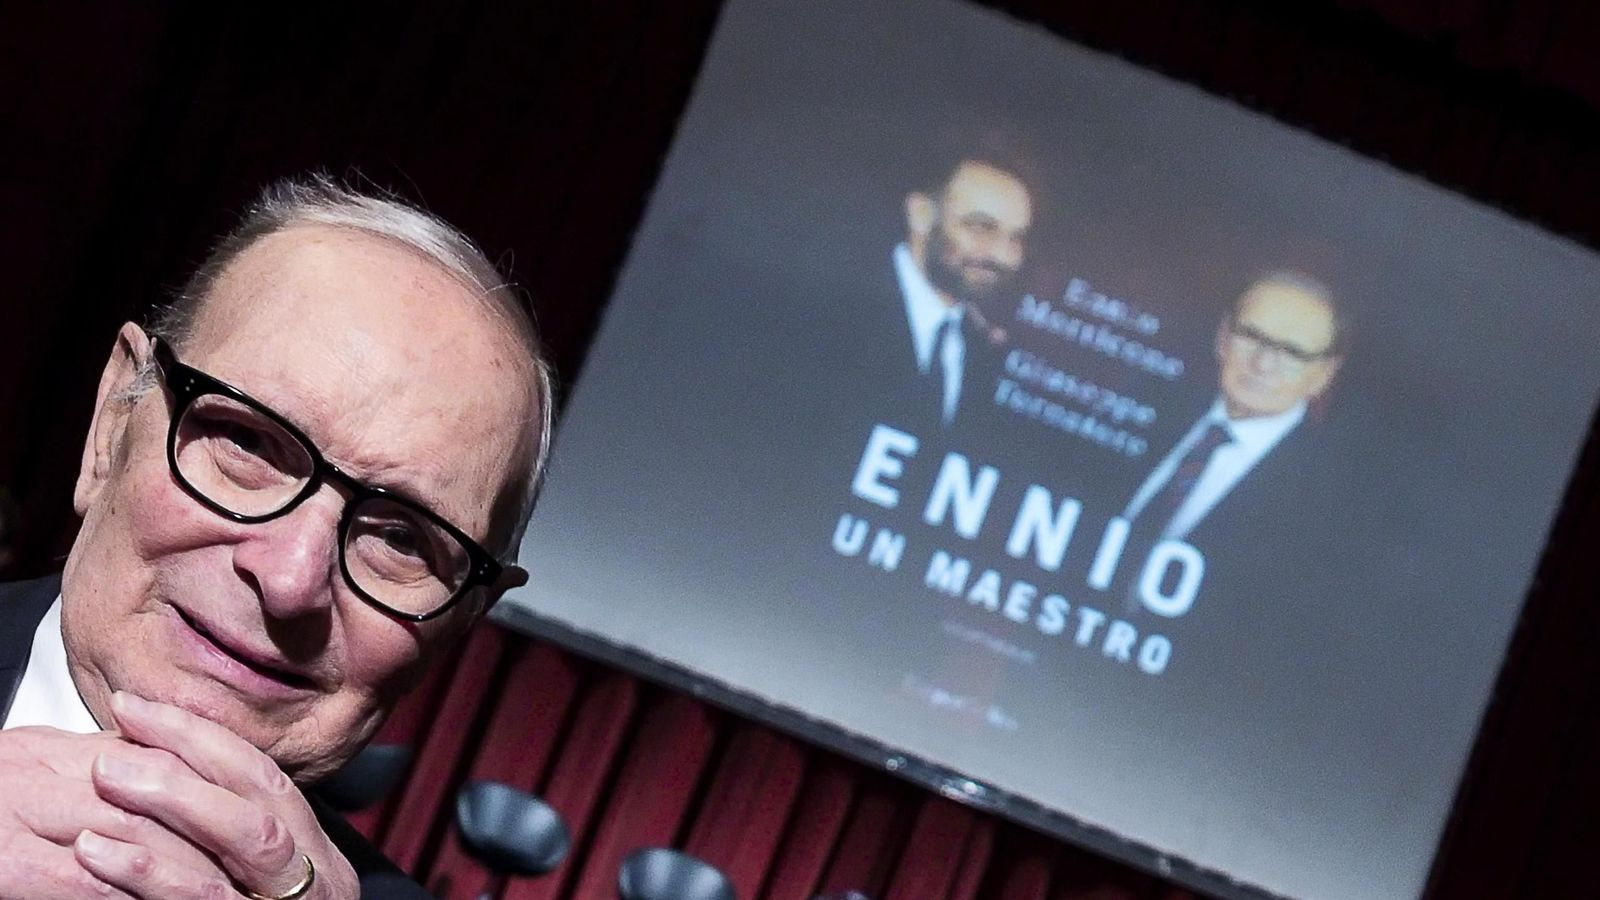 Ennio Morricone, a la presentació del llibre 'Ennio. Un maestro', en què conversa amb Giuseppe Tornatore, director de 'Cinema Paradiso'